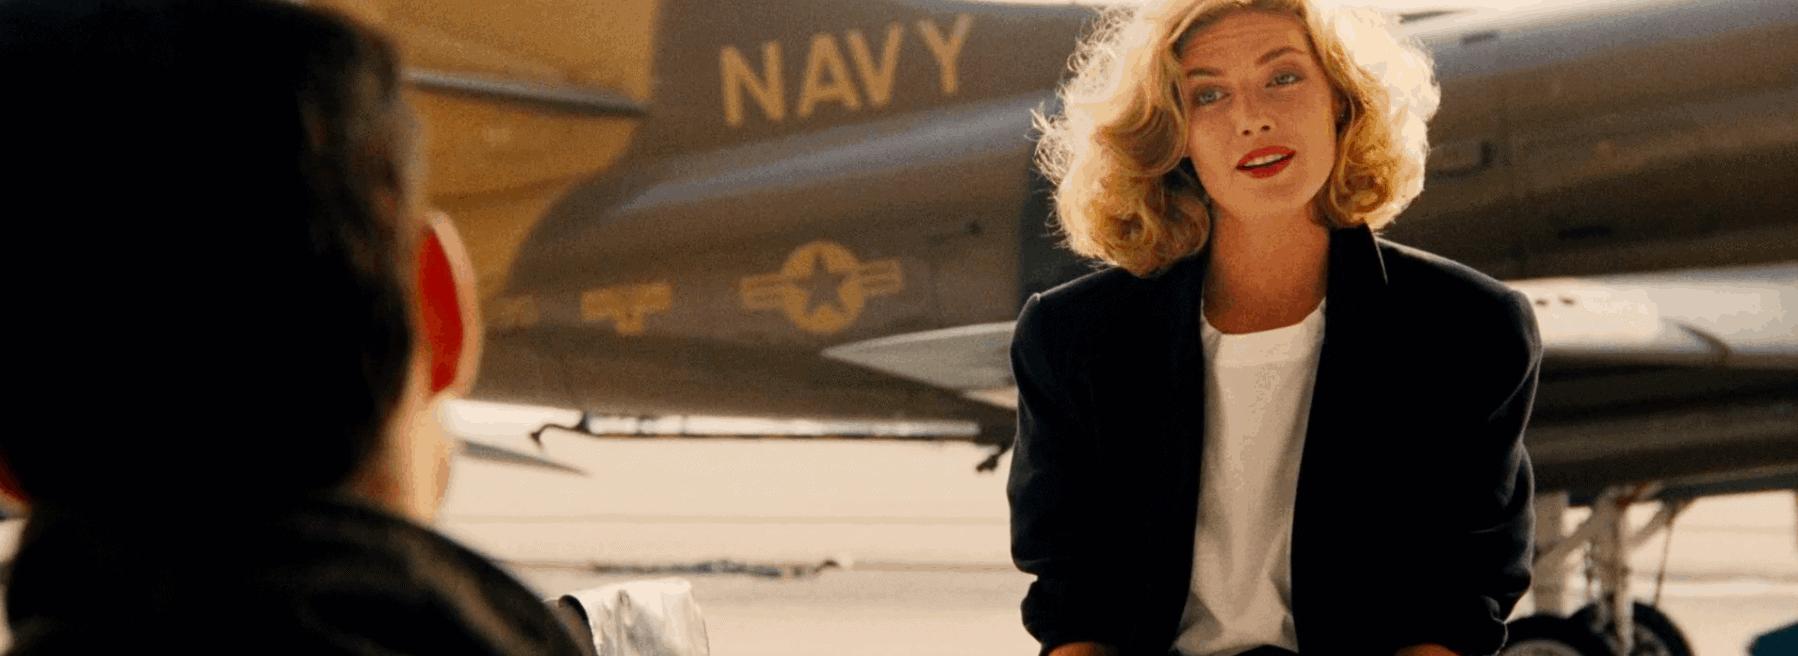 Top Gun: Jet Propaganda in an UAV world [4K Ultra HD review] 7